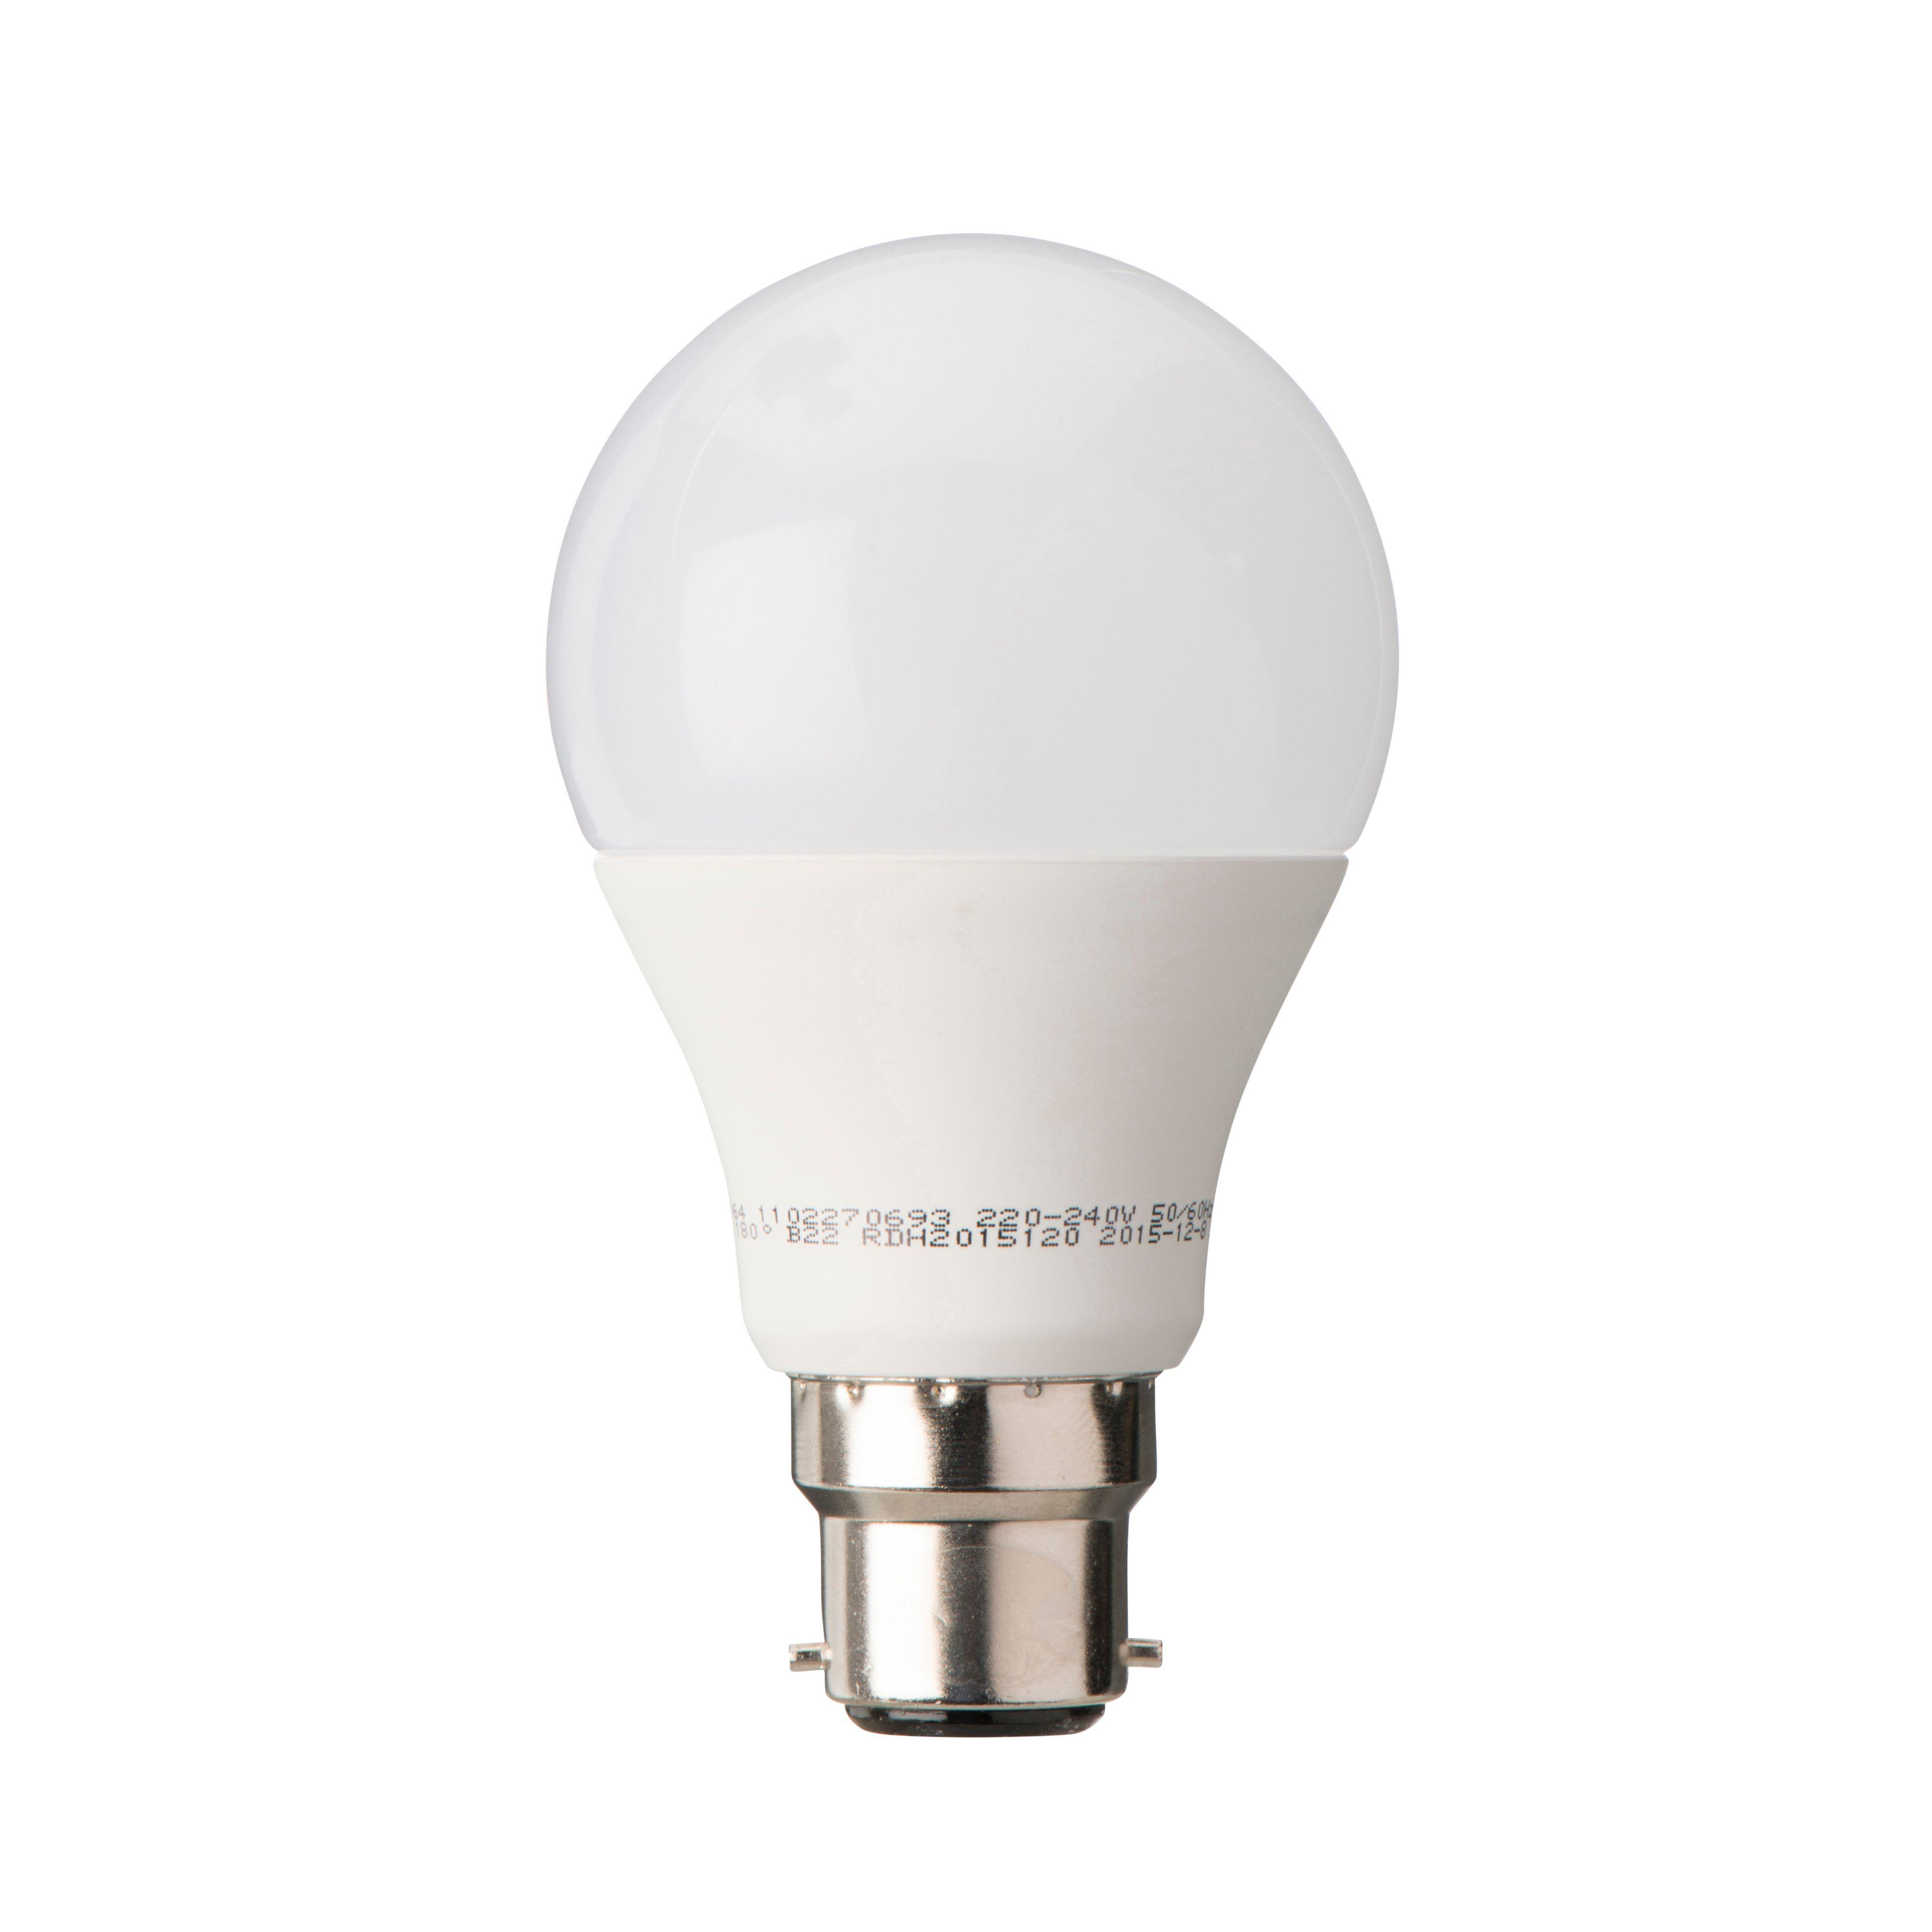 Diall b22 1055lm led dimmable classic light bulb departments diall b22 1055lm led dimmable classic light bulb departments diy at bq buycottarizona